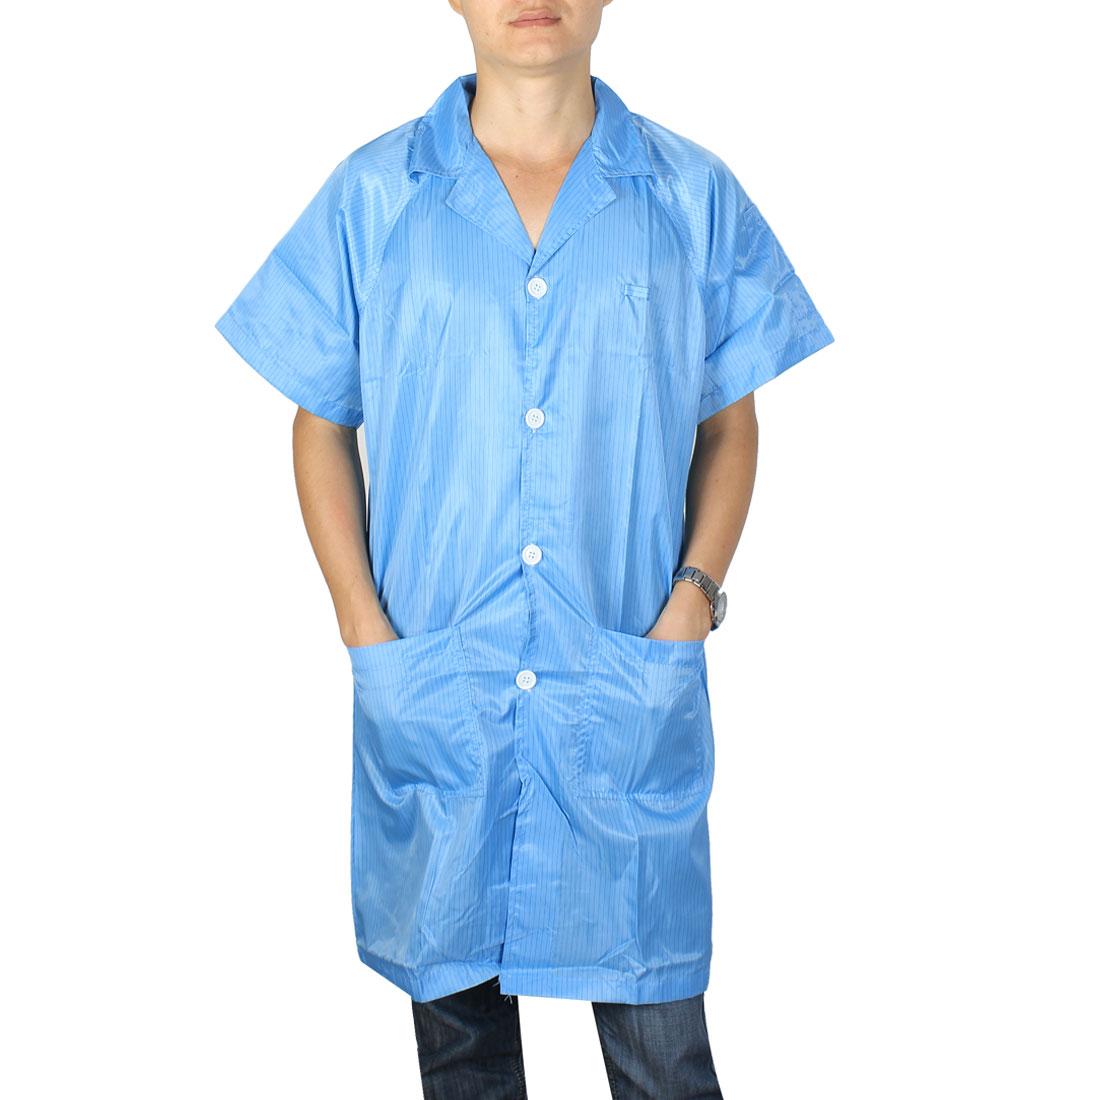 Unisex Lapel Collar Button Up ESD Lab Anti Static Overalls Coat Uniform Blue XL